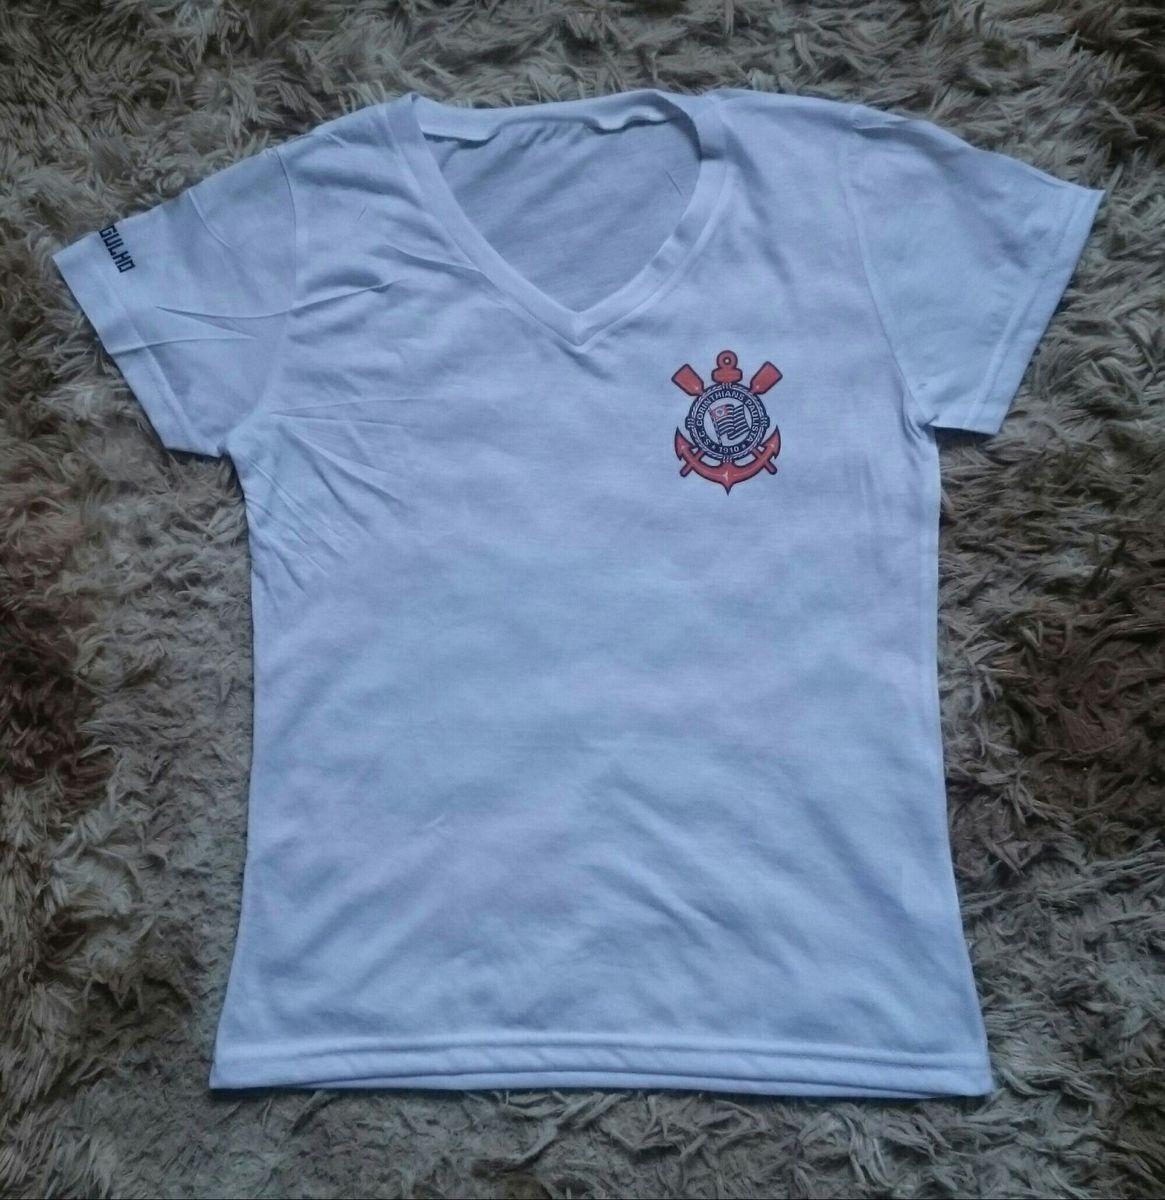 camisa do corinthians feminina personalizada - camisetas sem-marca d0559eb3efa21